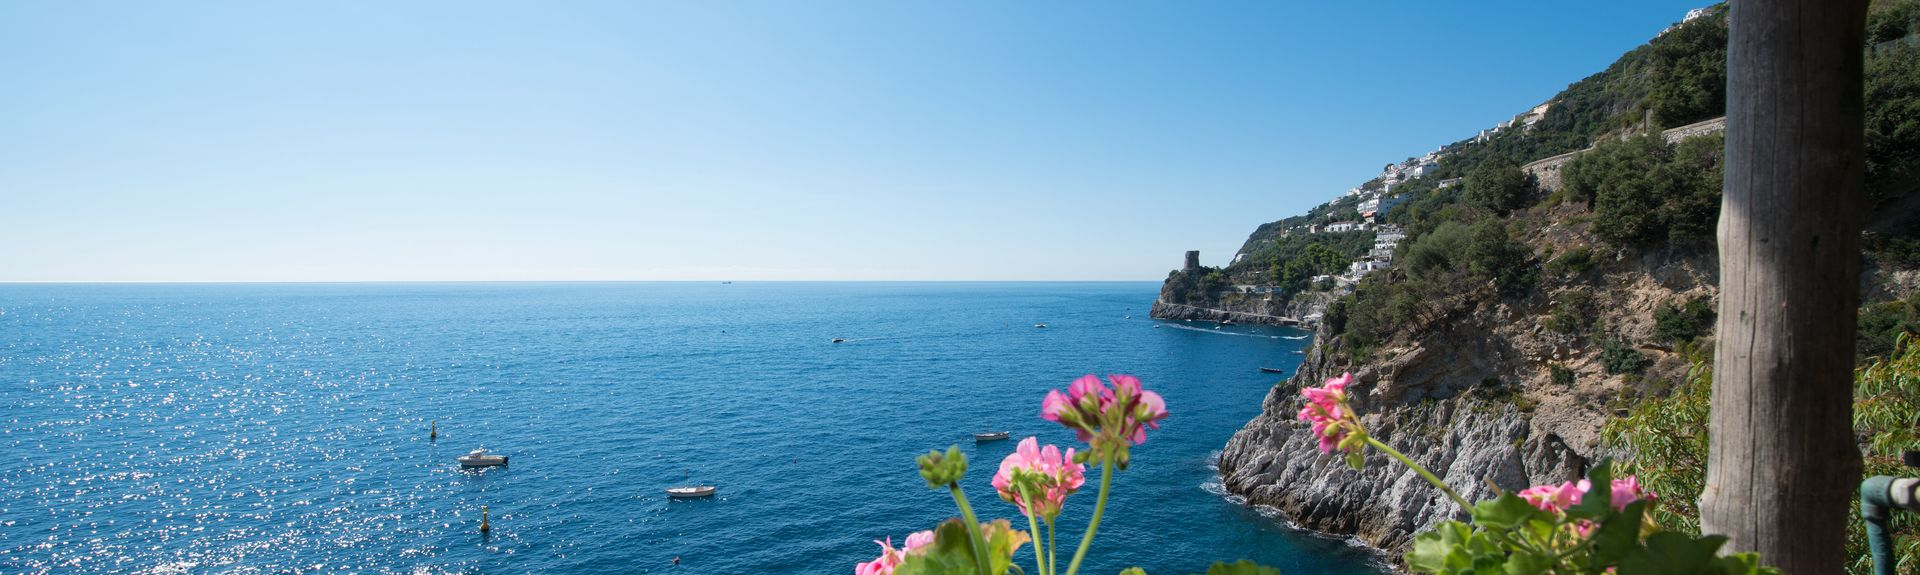 Strand Amalfi, Amalfi, Campania, Italië